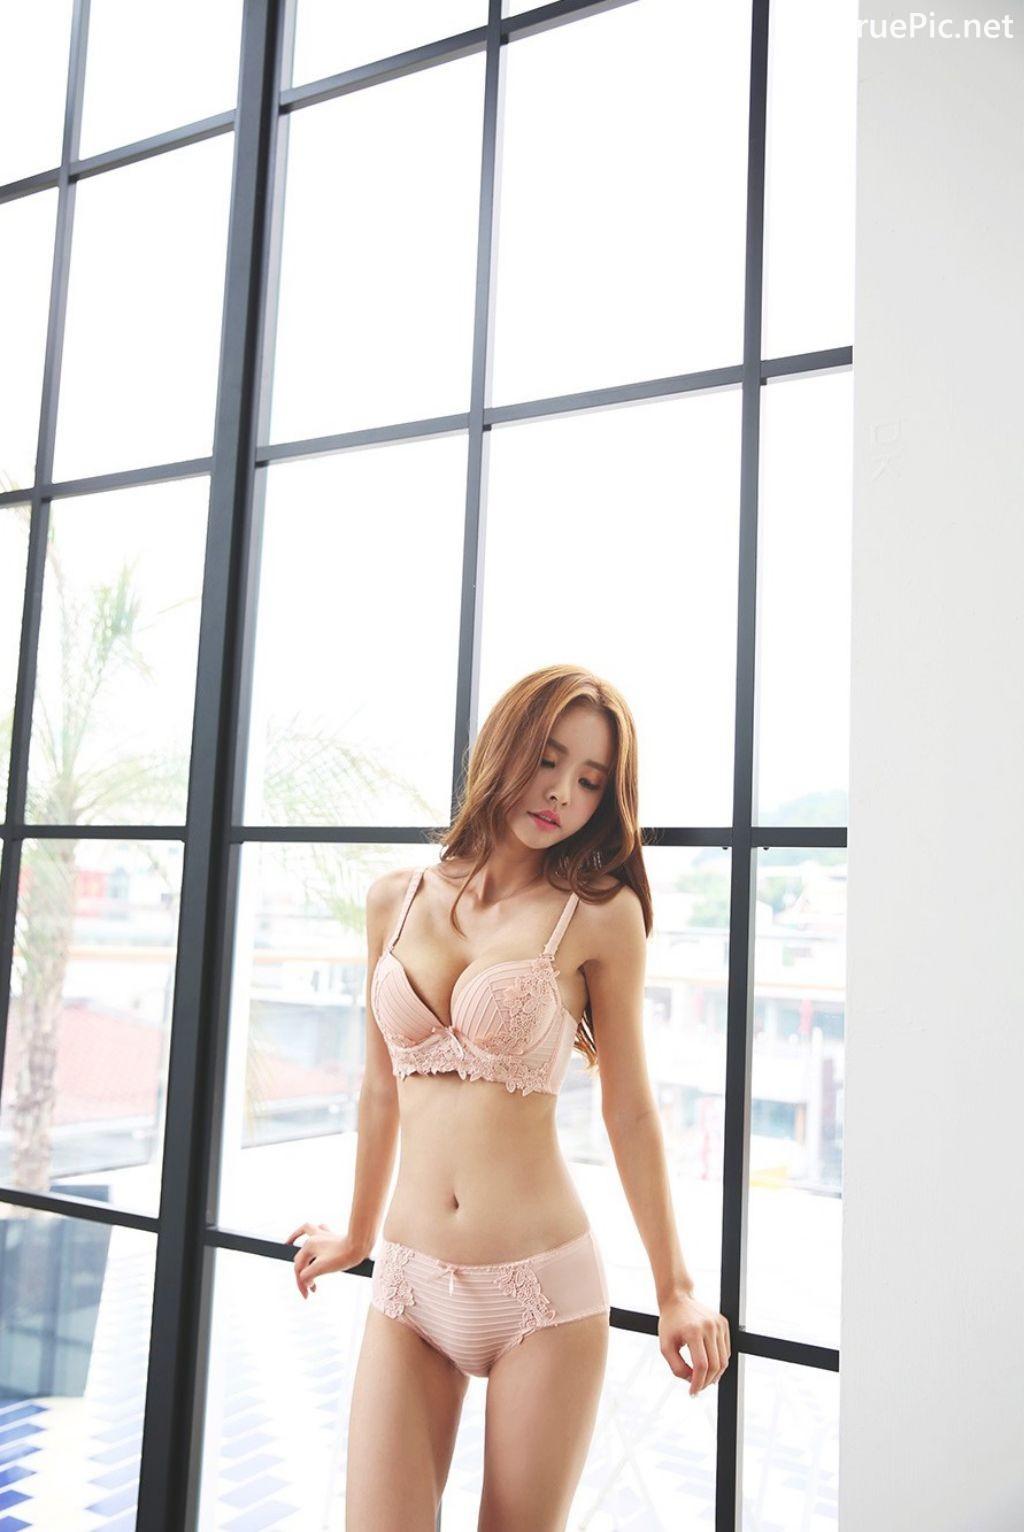 Image-Korean-Fashion Model-Shin-Eun-Ji-Various-Lingerie-Set-Collection-TruePic.net- Picture-2